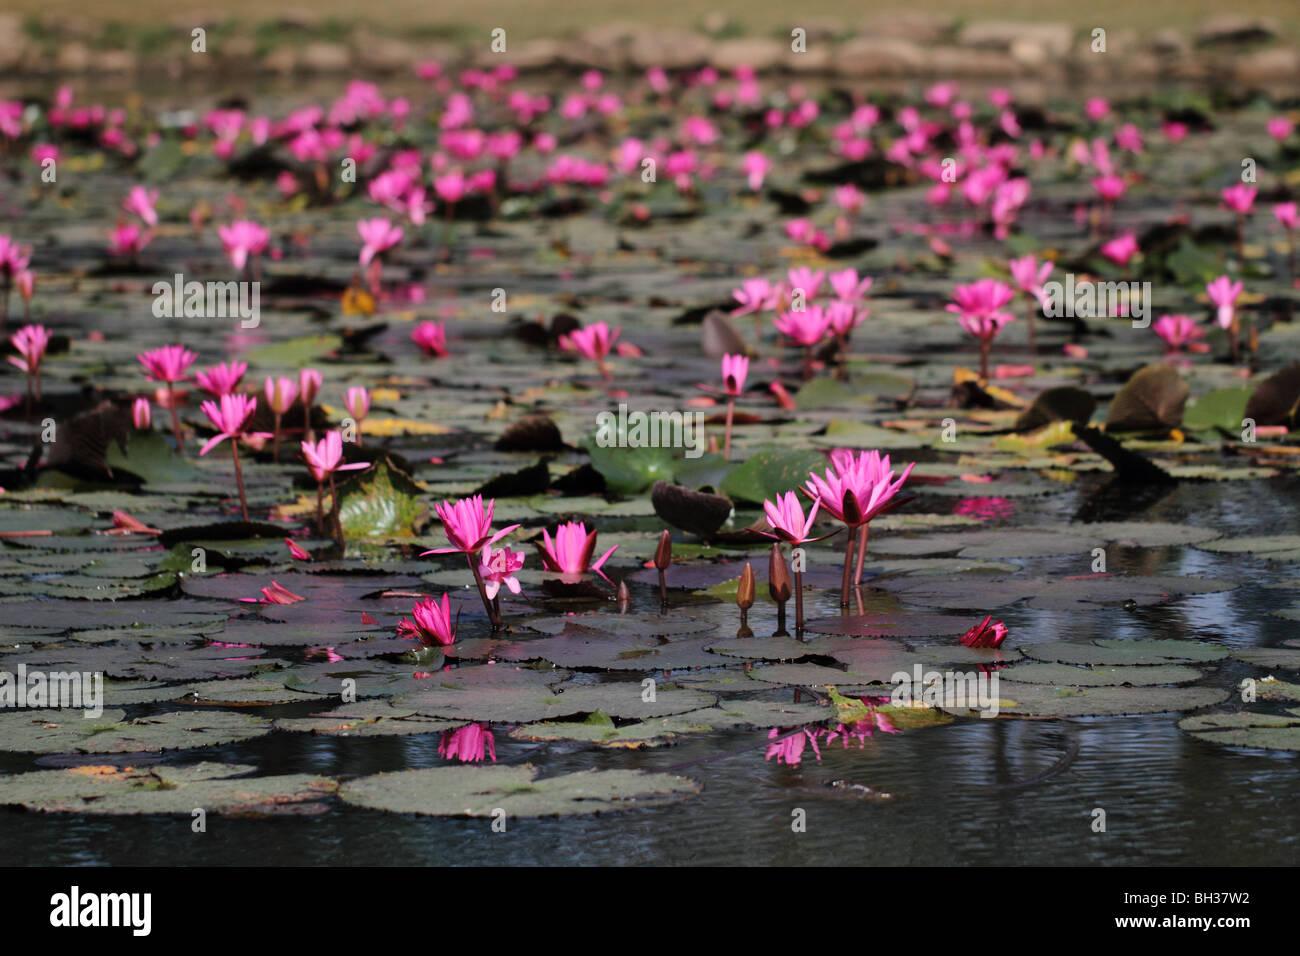 Lotus Flowers In Pond Stock Photos Lotus Flowers In Pond Stock